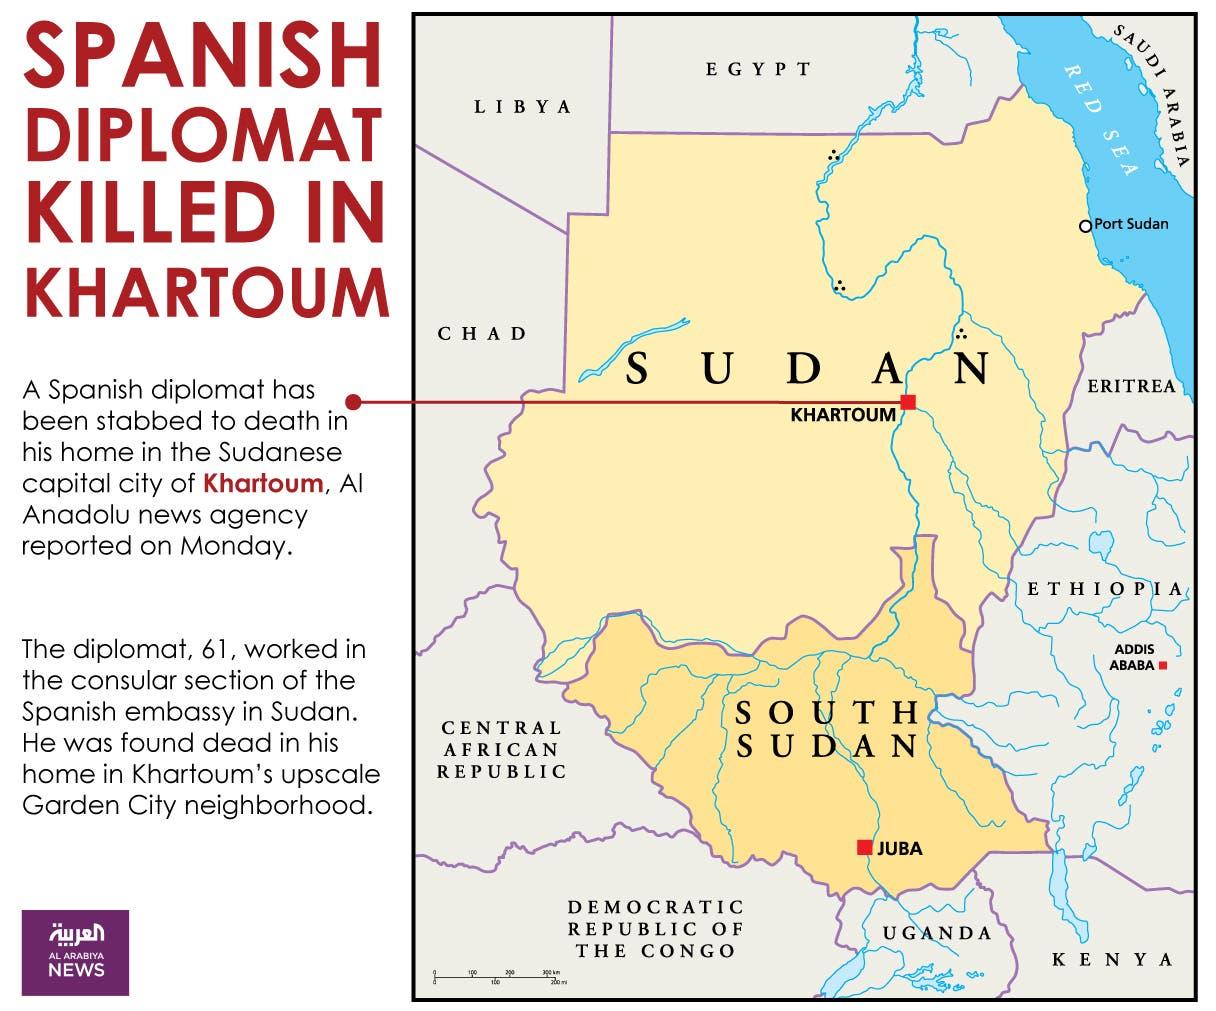 Infographic: Spanish diplomat killed in Khartoum